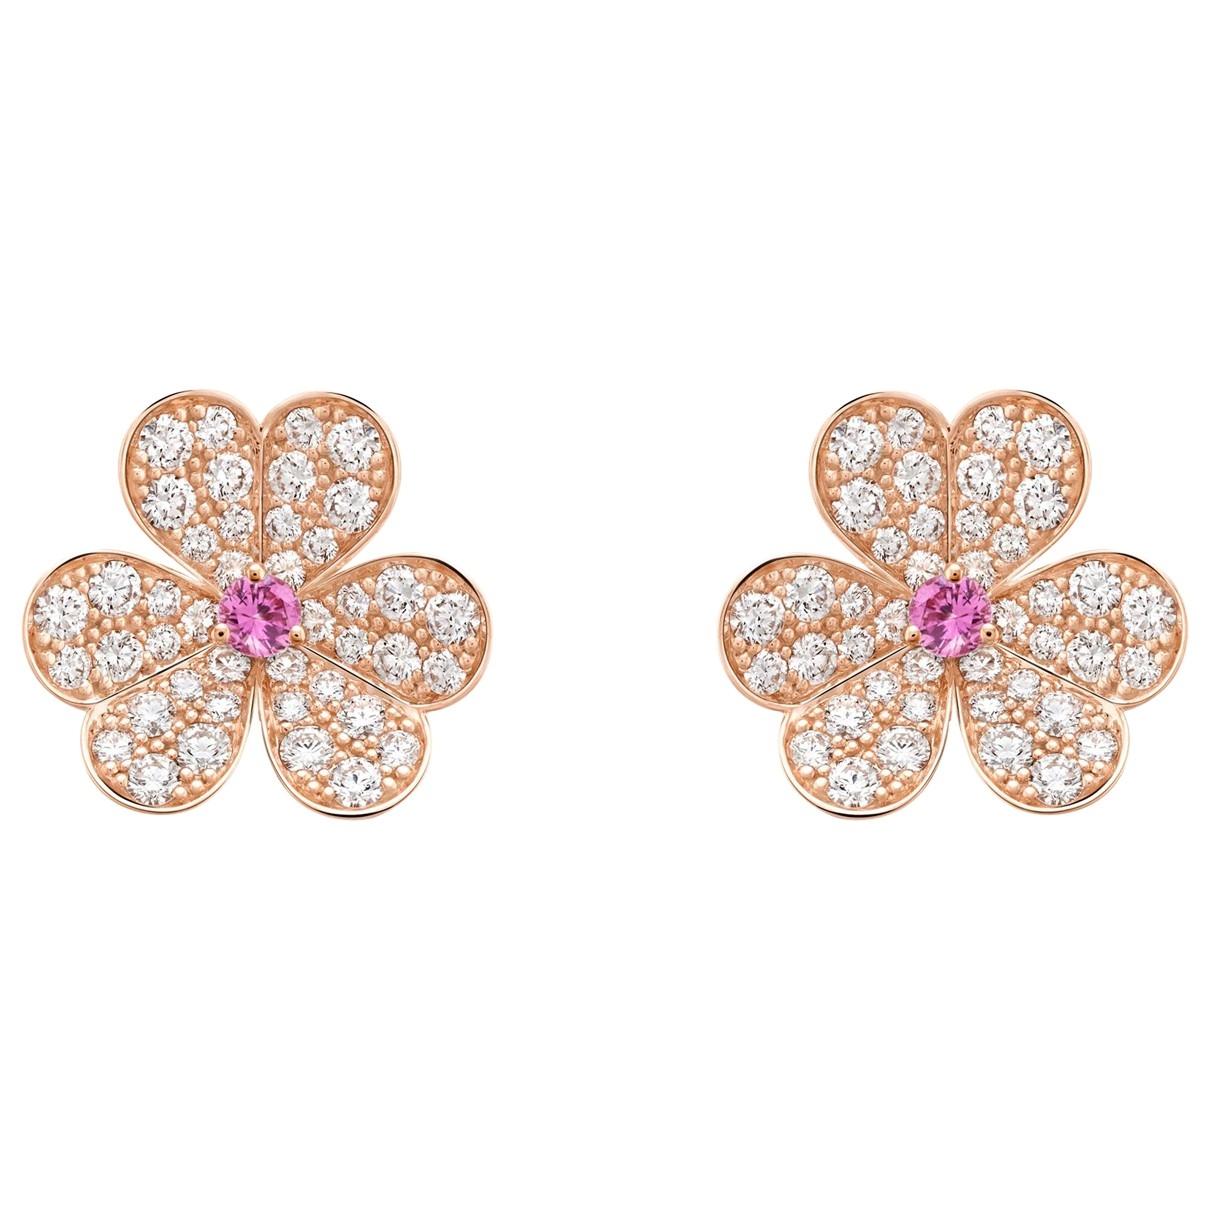 Van Cleef & Arpels Fleurs OhrRing in  Rosa Rosegold